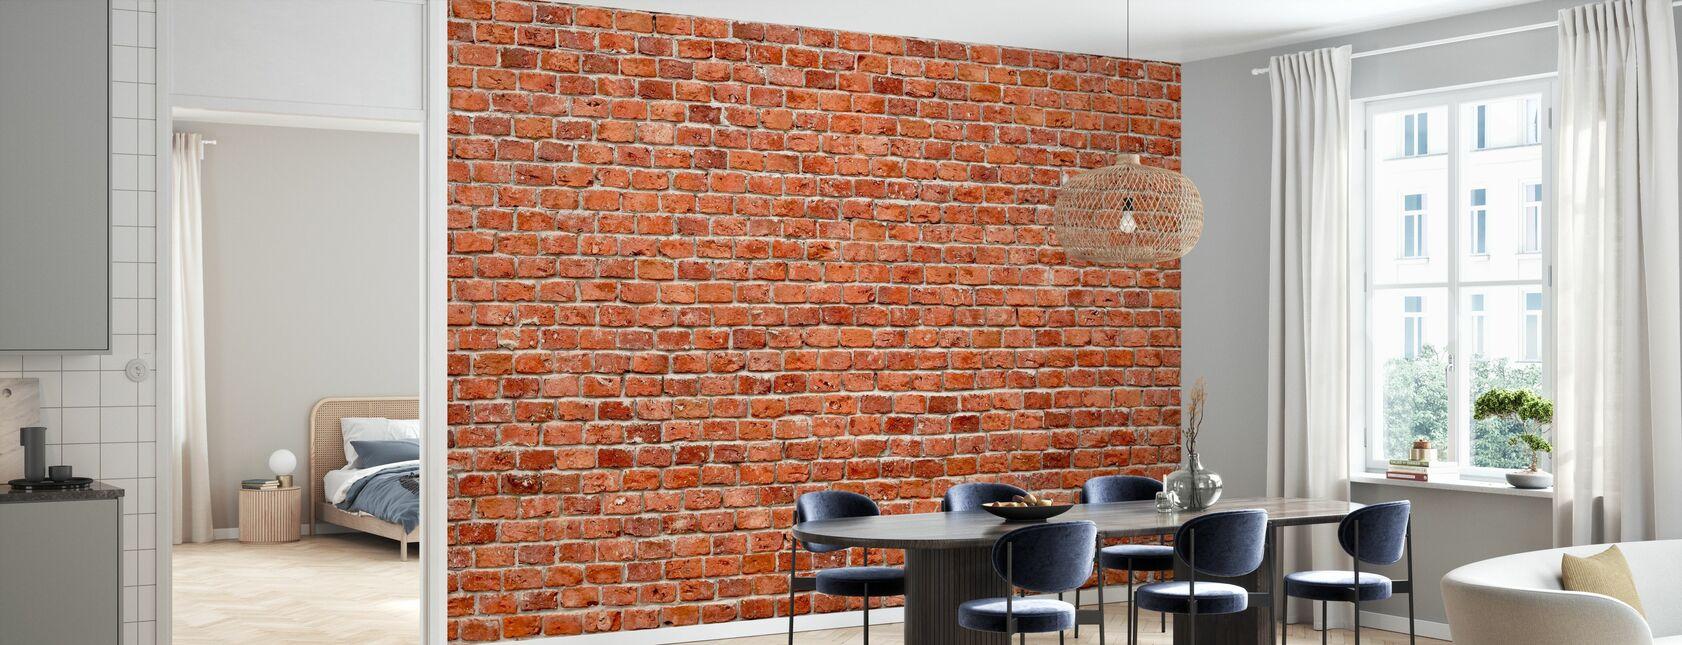 Brick Wall - Wallpaper - Kitchen